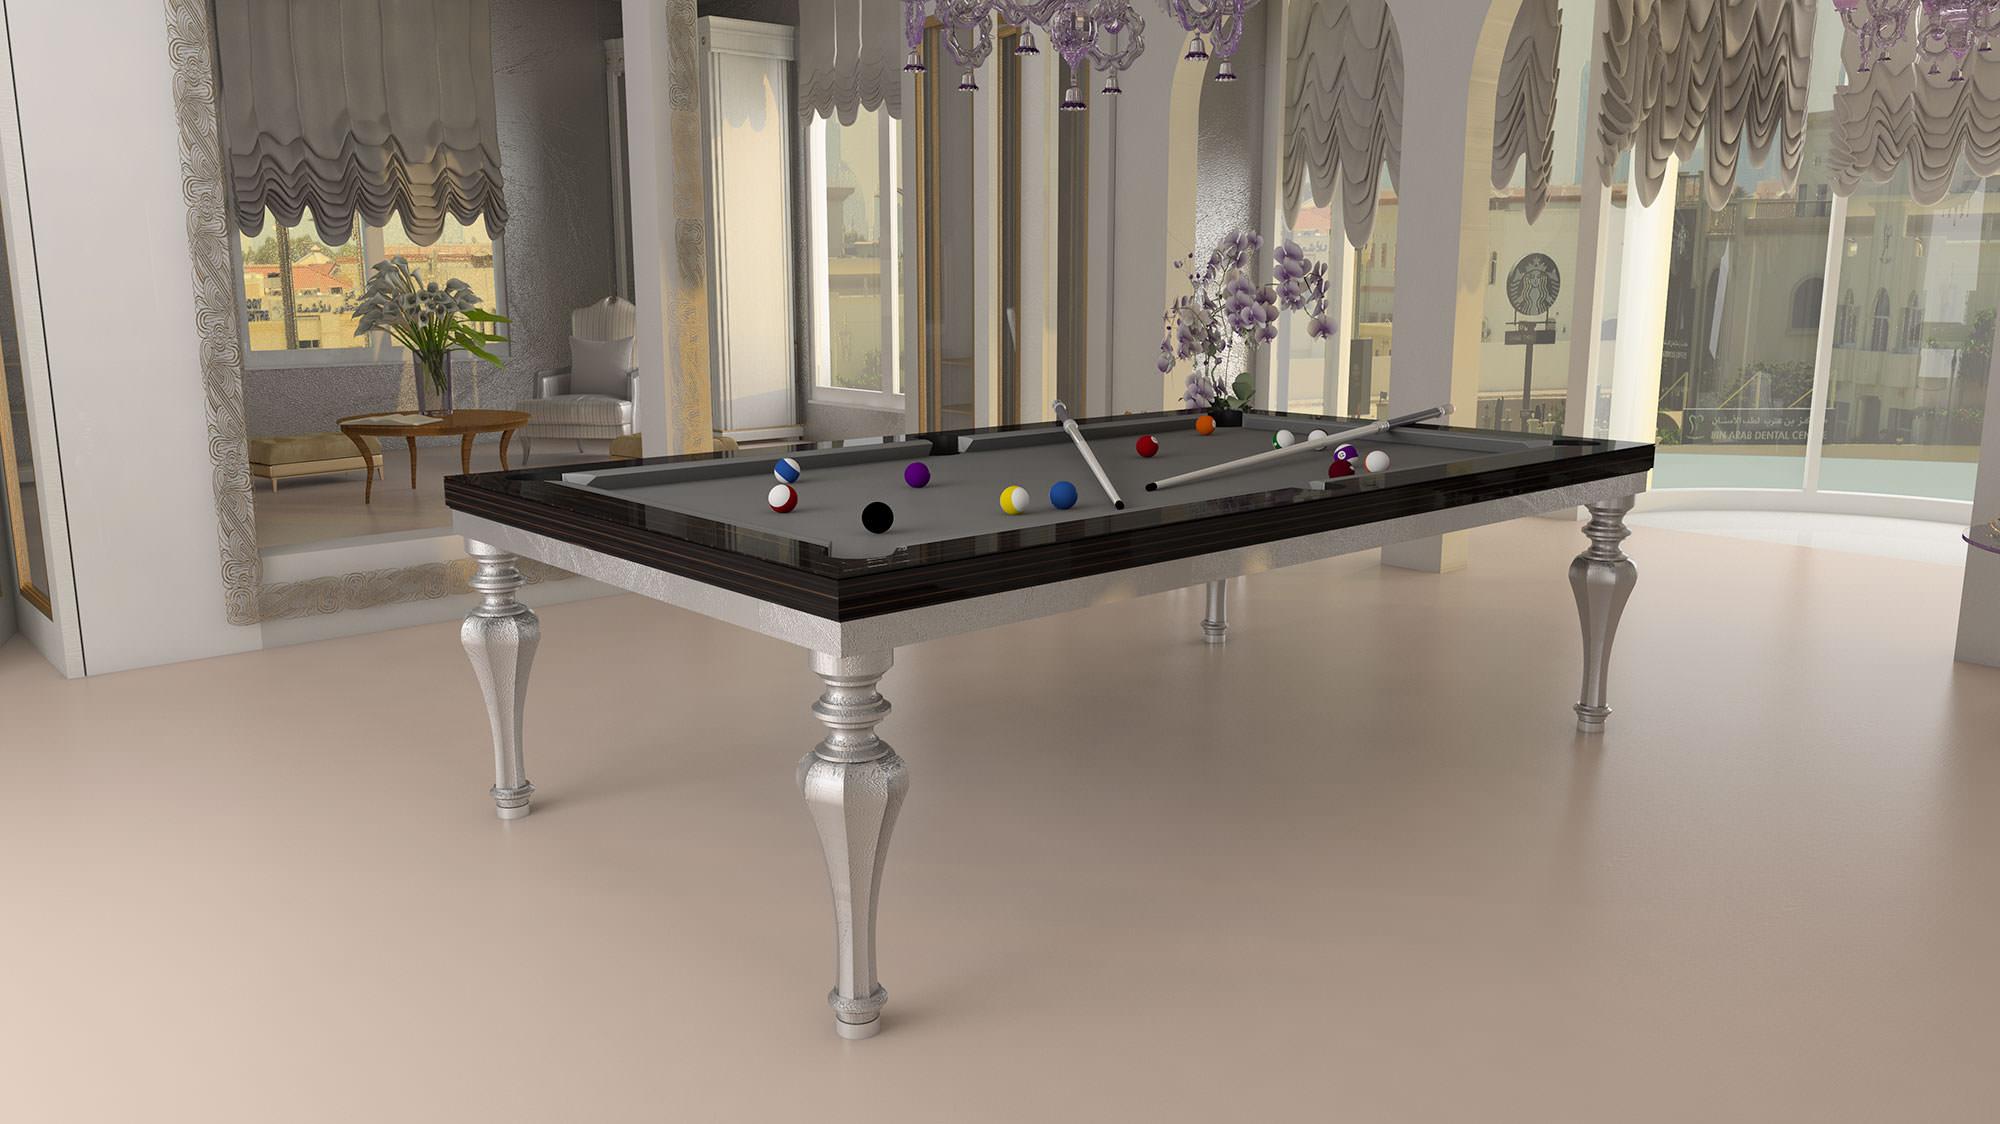 biliardo trasformabile in tavolo da pranzo praga